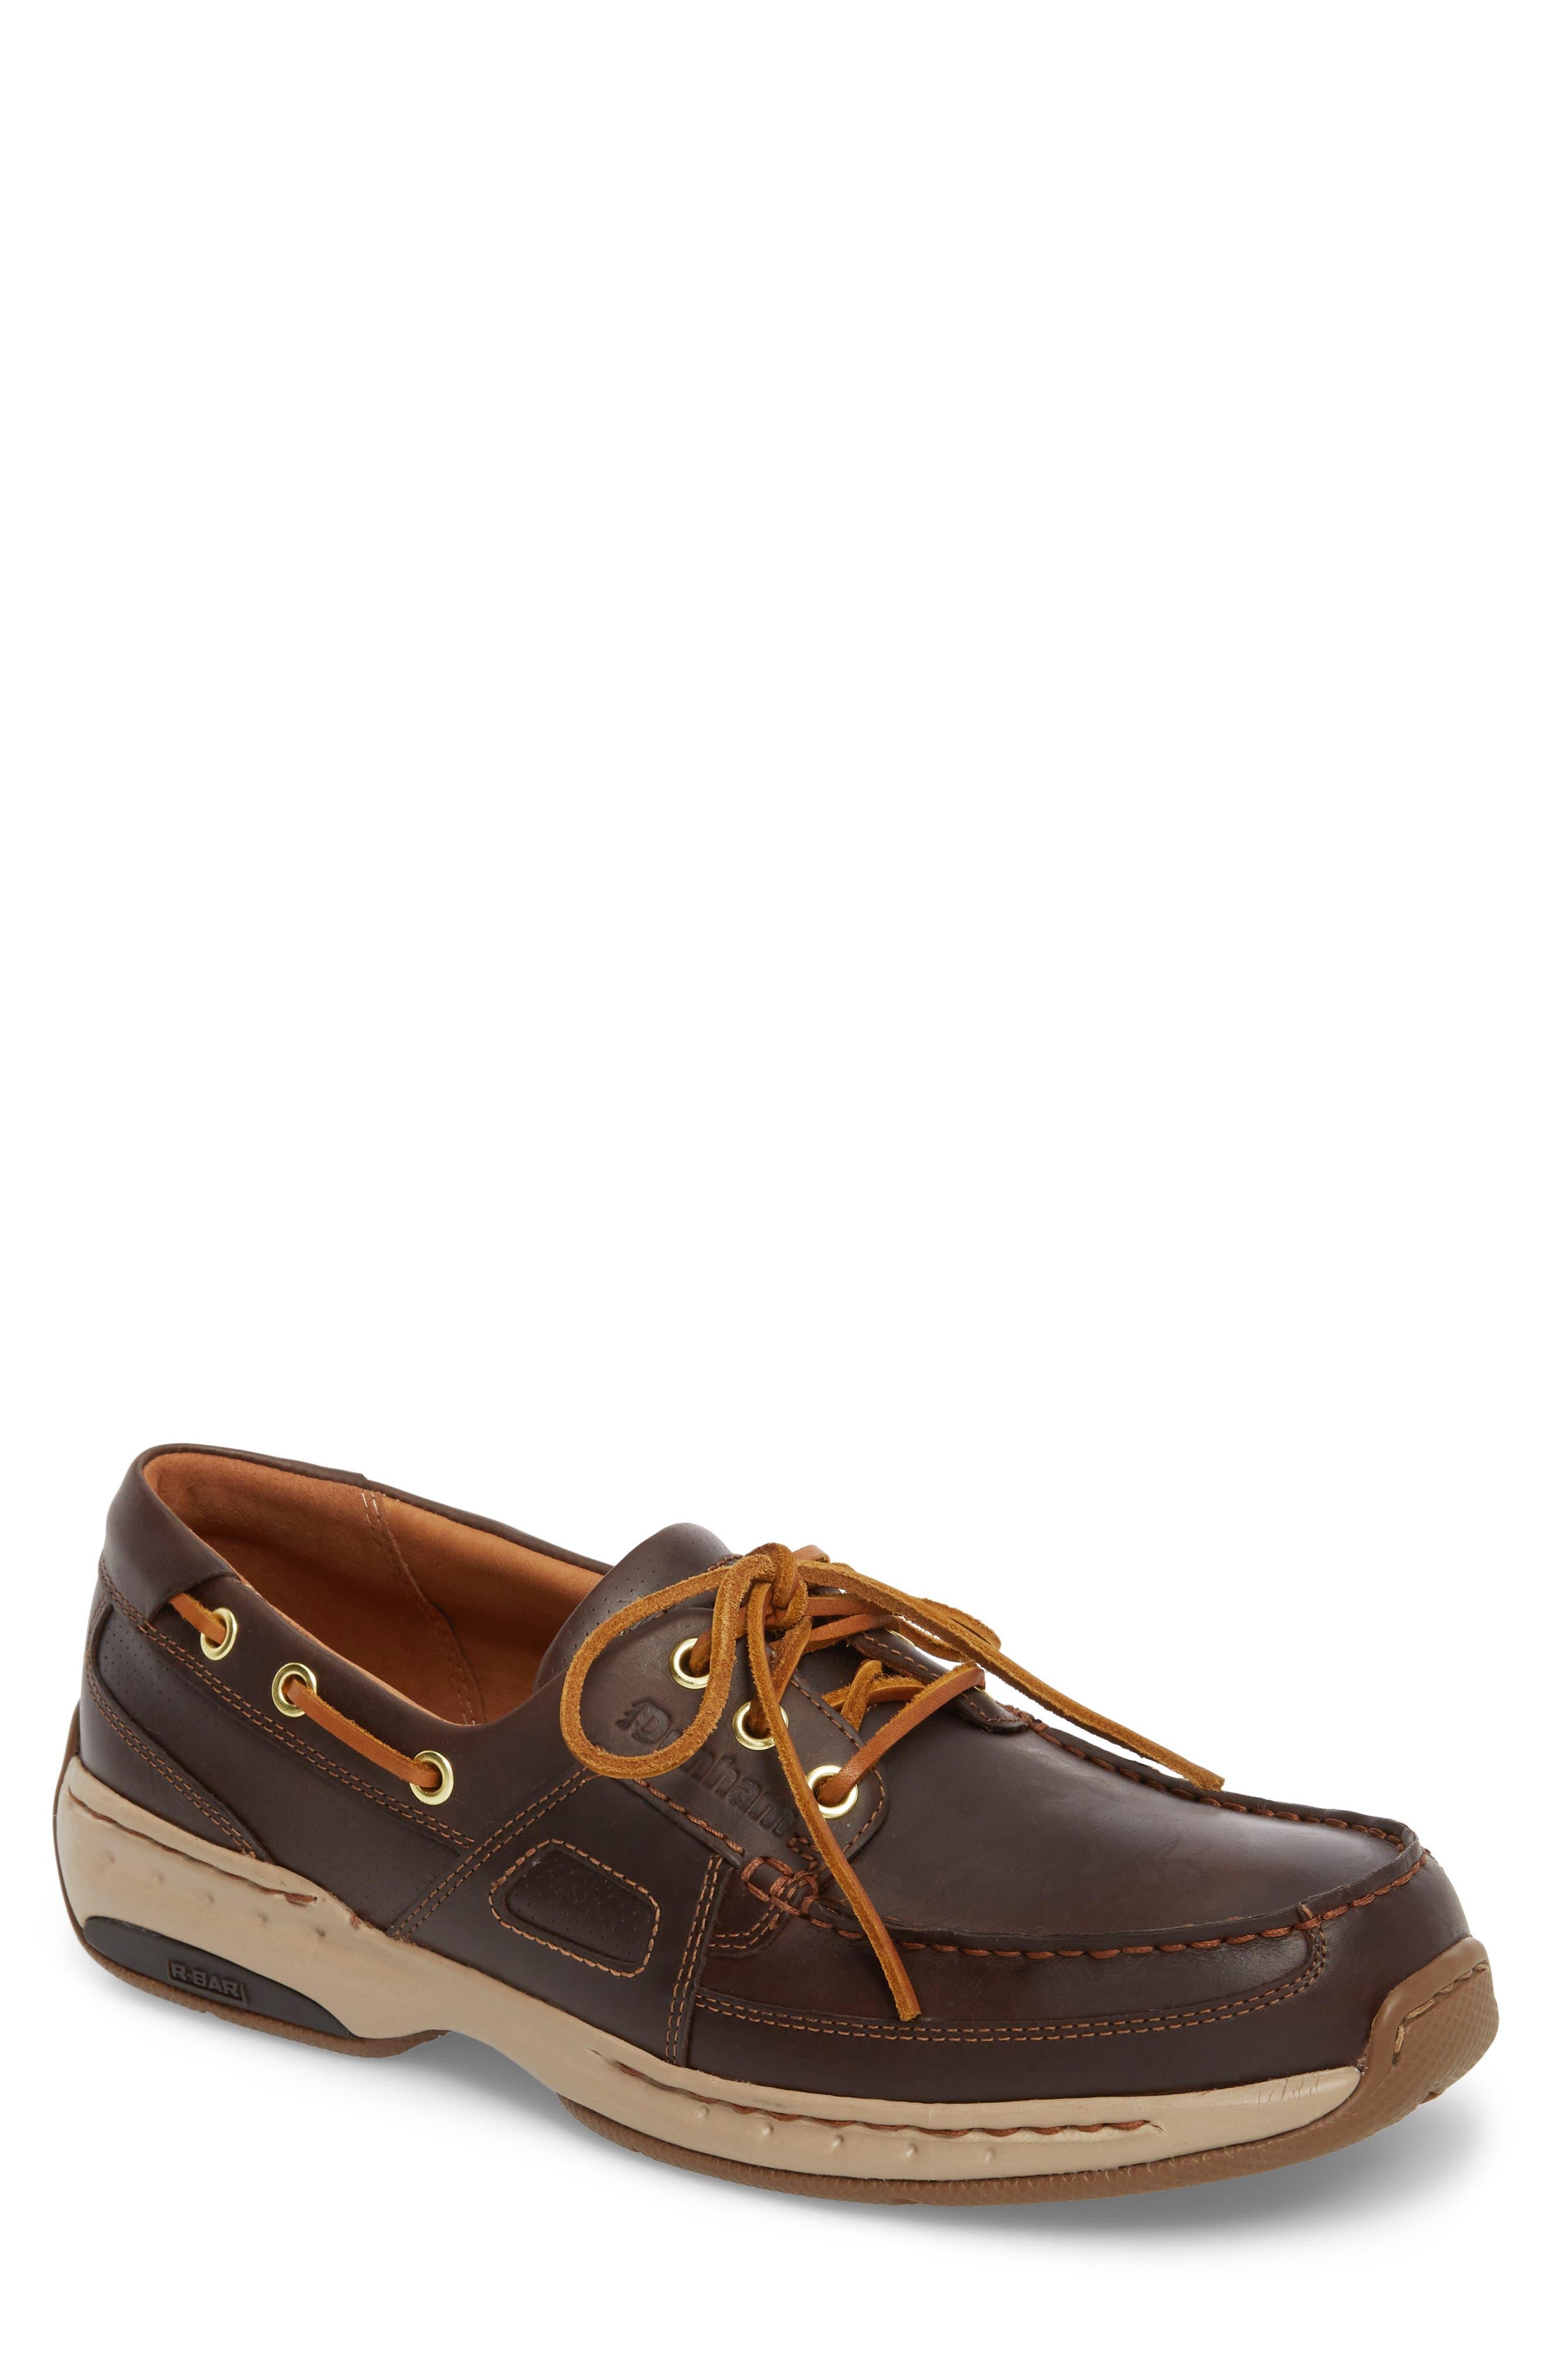 LTD Water Resistant Boat Shoe,                         Main,                         color, Tan Leather